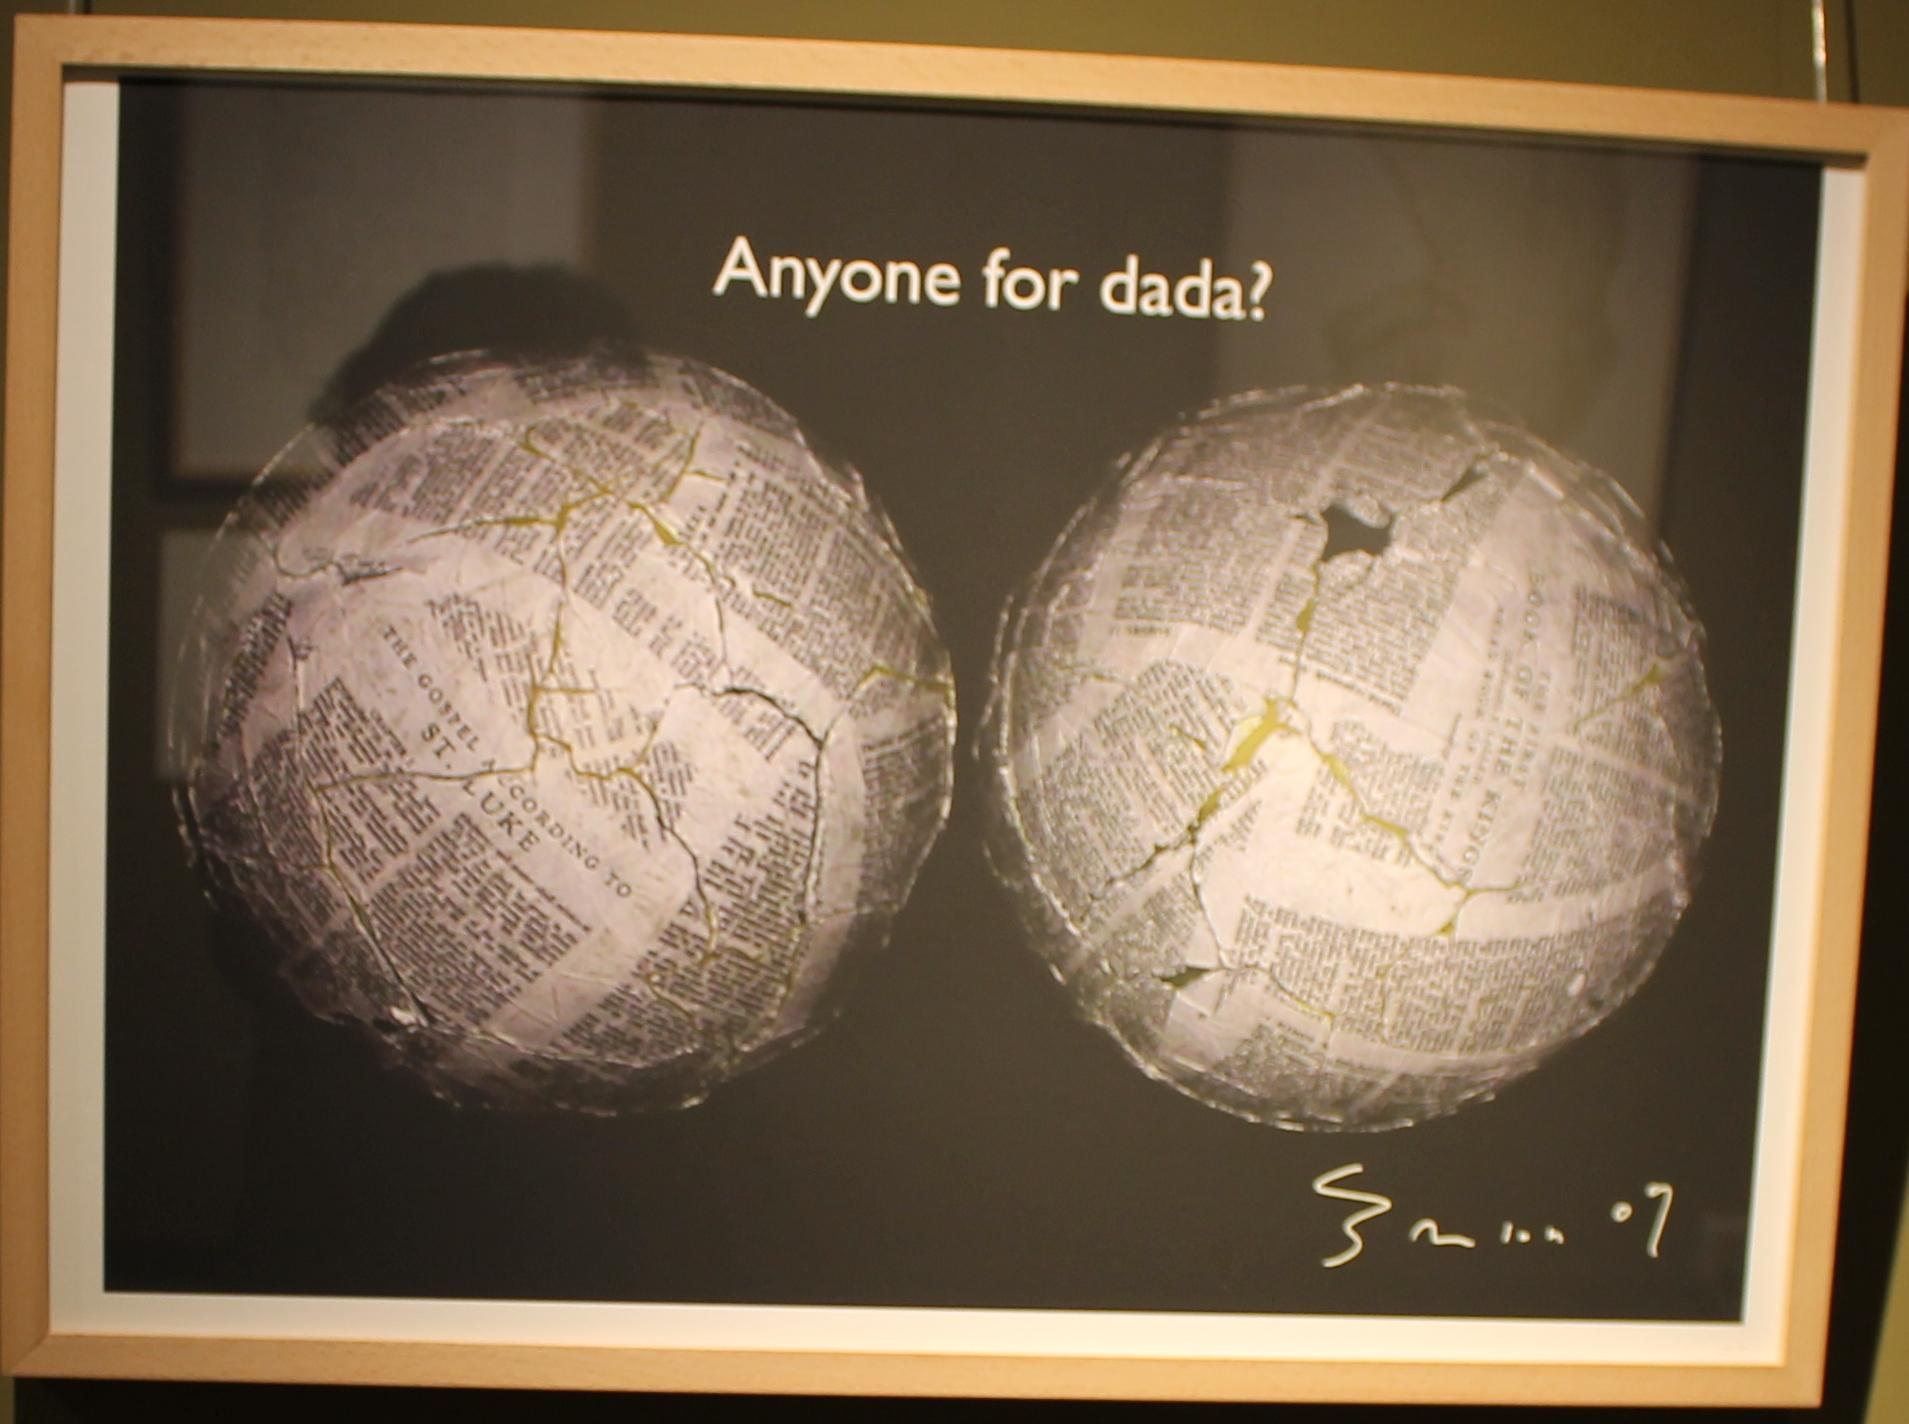 Anyone for dada?